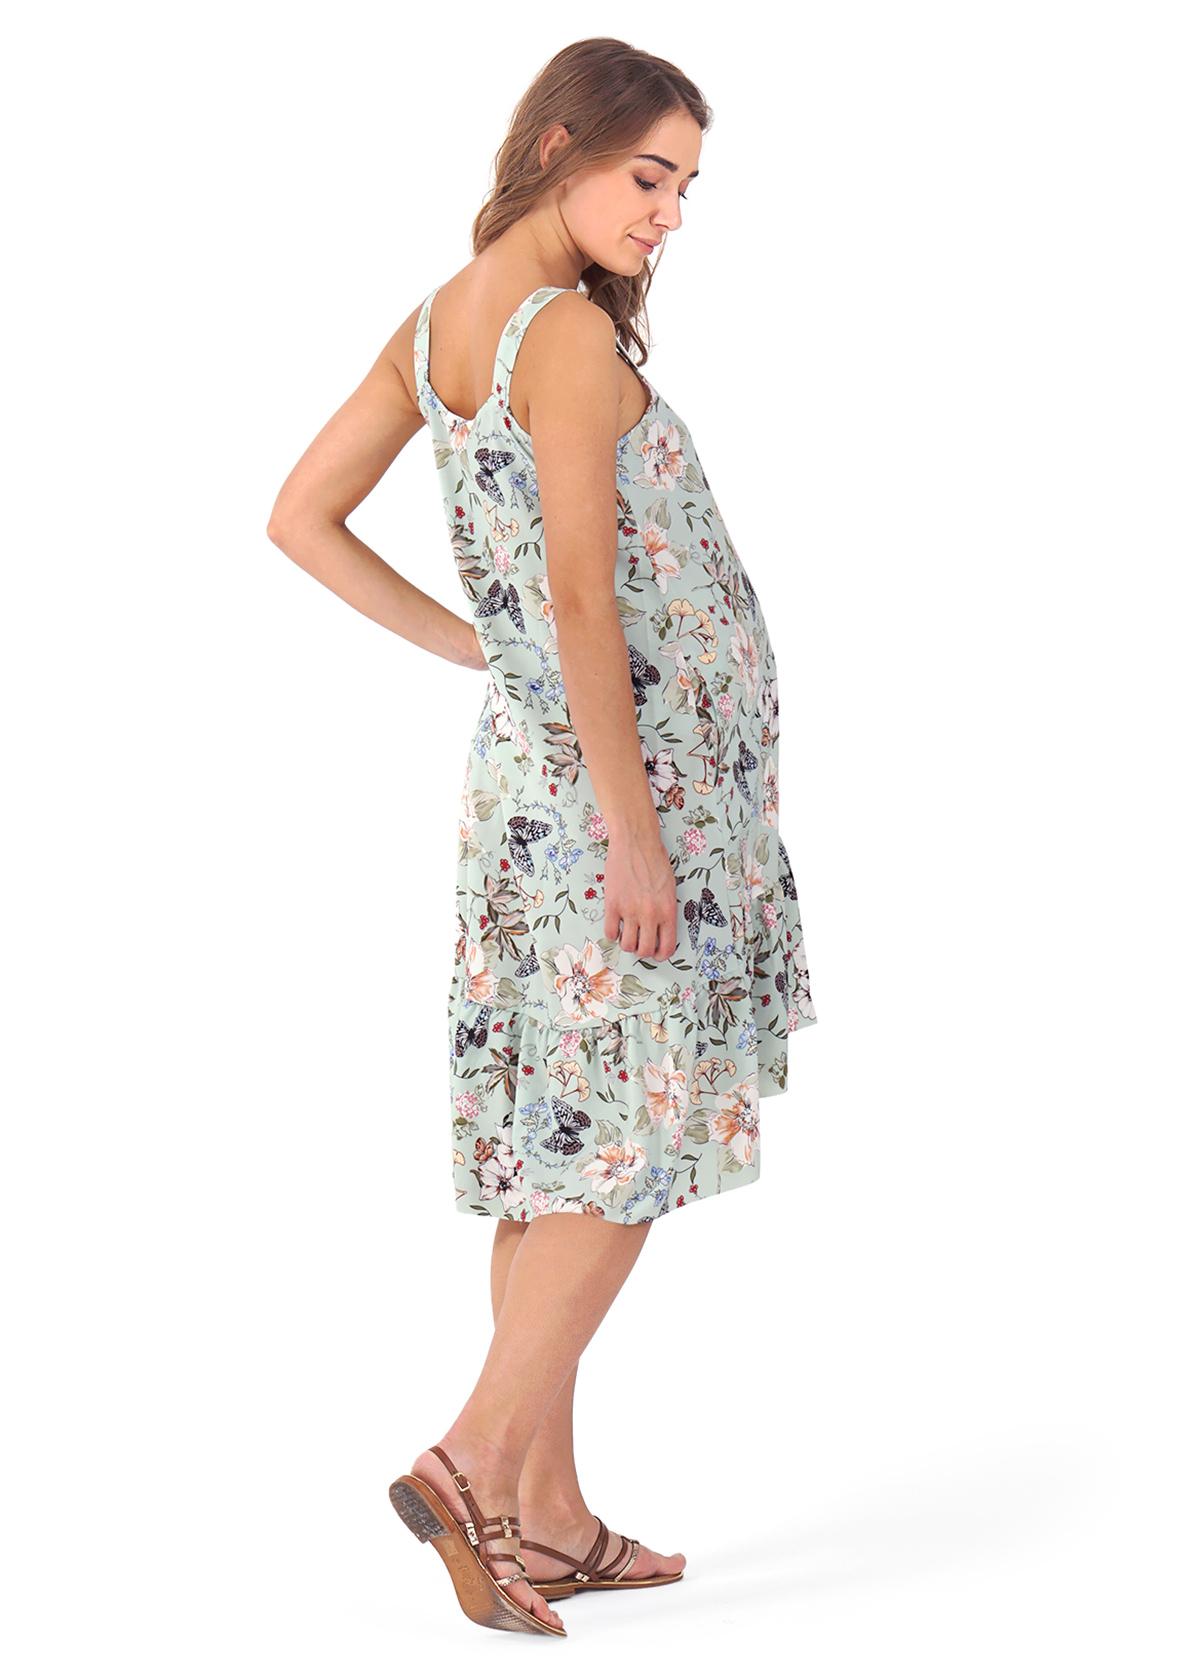 Maternity Sundress | Maternity Coats | Maternity Dresses for Baby Showers